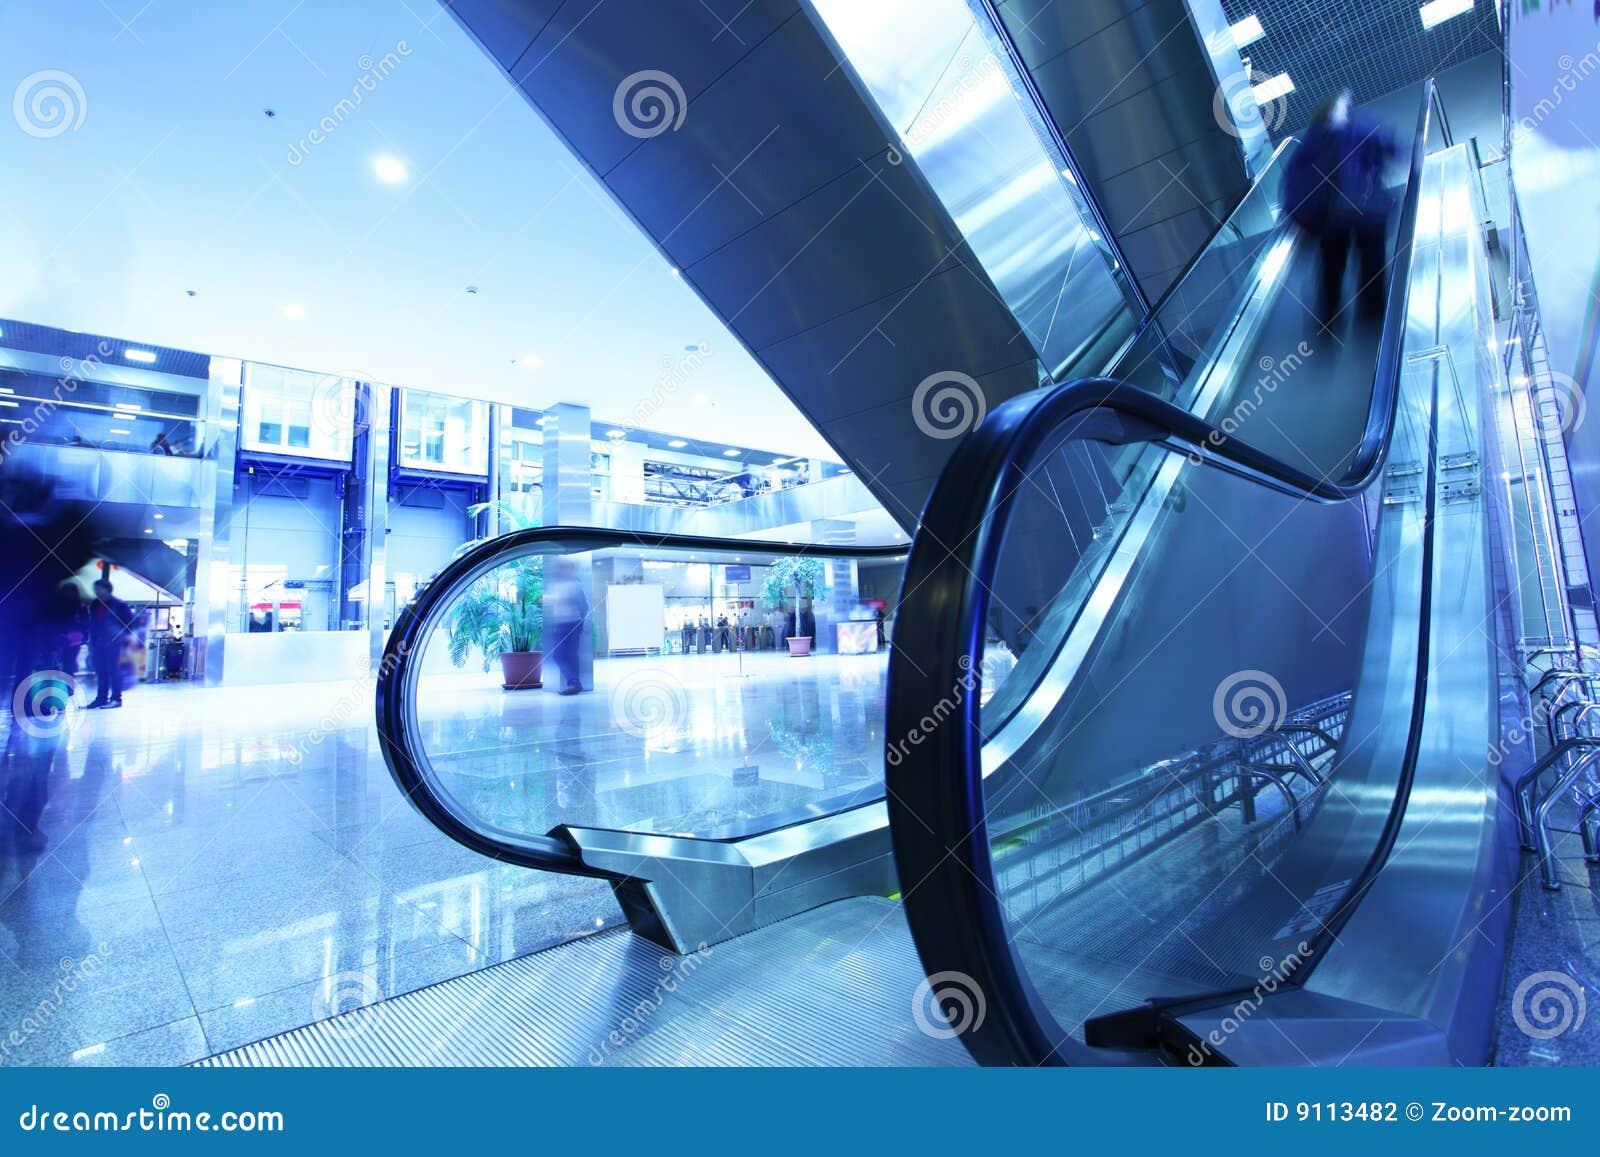 Modern interior with escalator